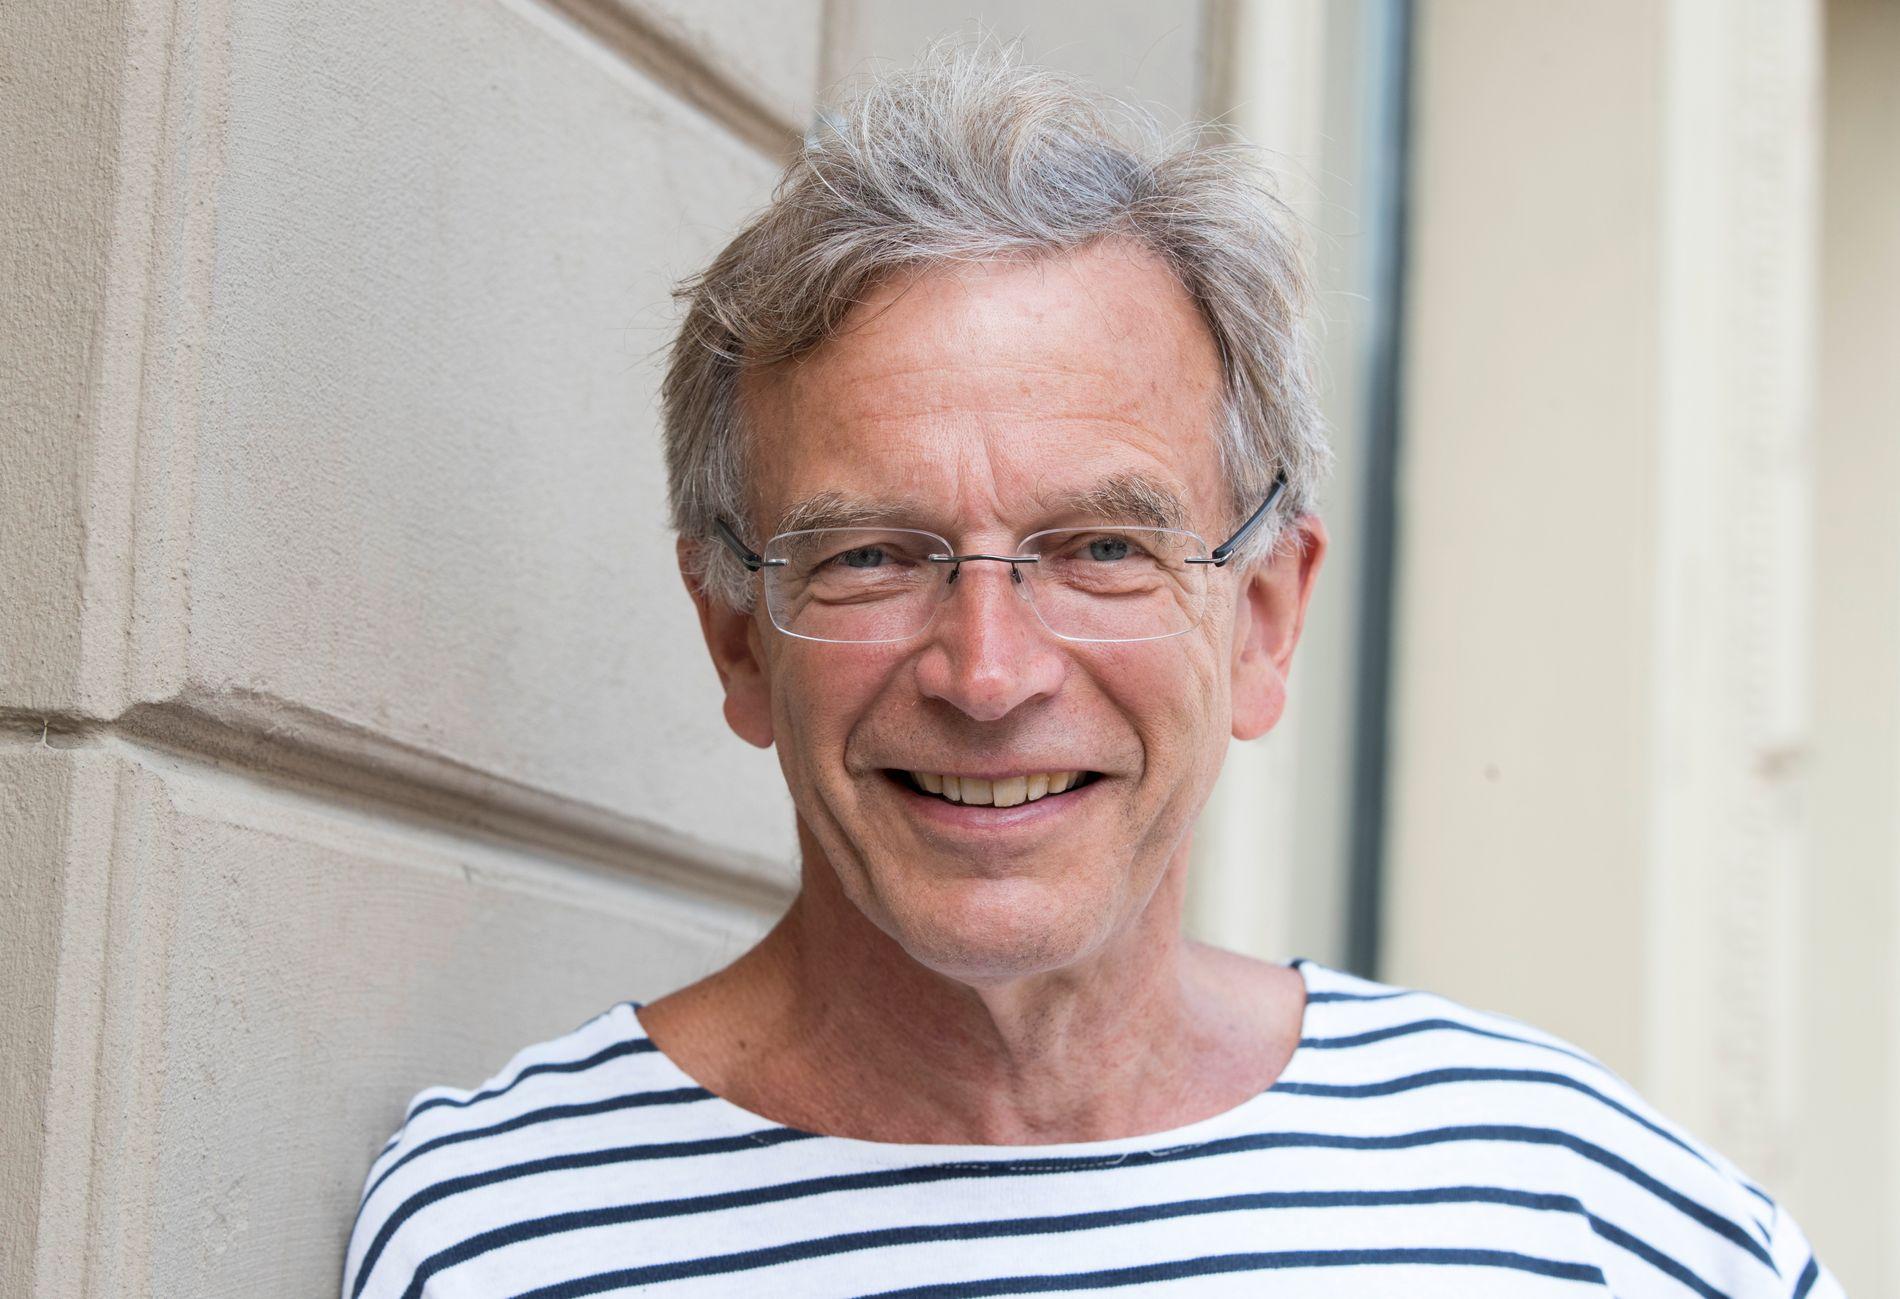 FORSKER: Stein Tønnesson er Asia-forsker ved Institutt for fredsforskning